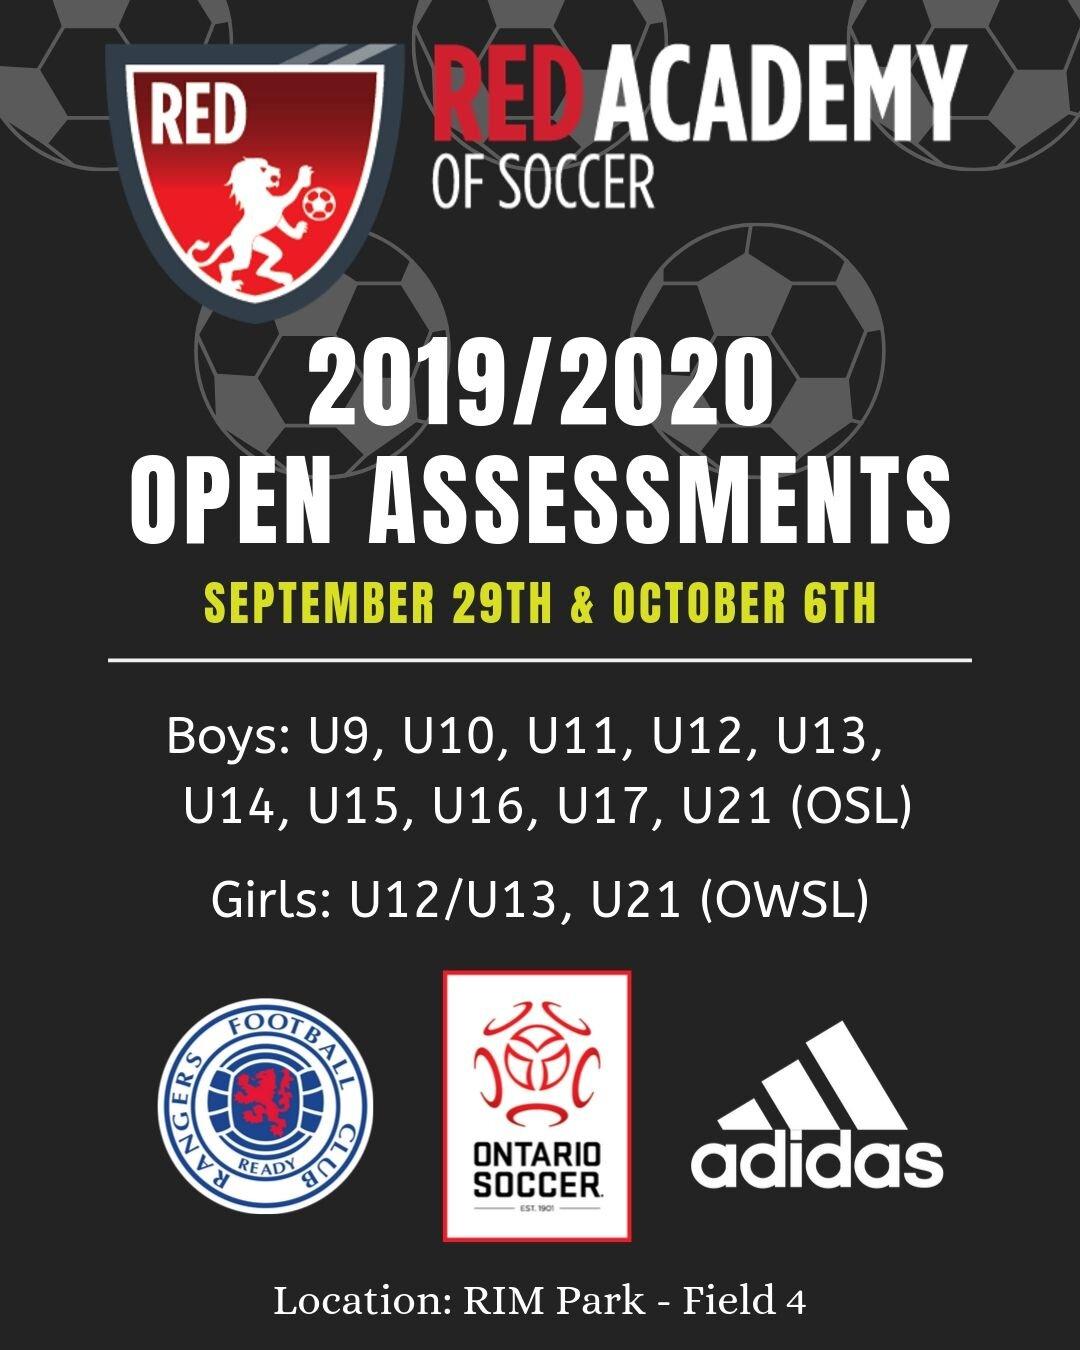 2019_2020 open assessments-2.jpg